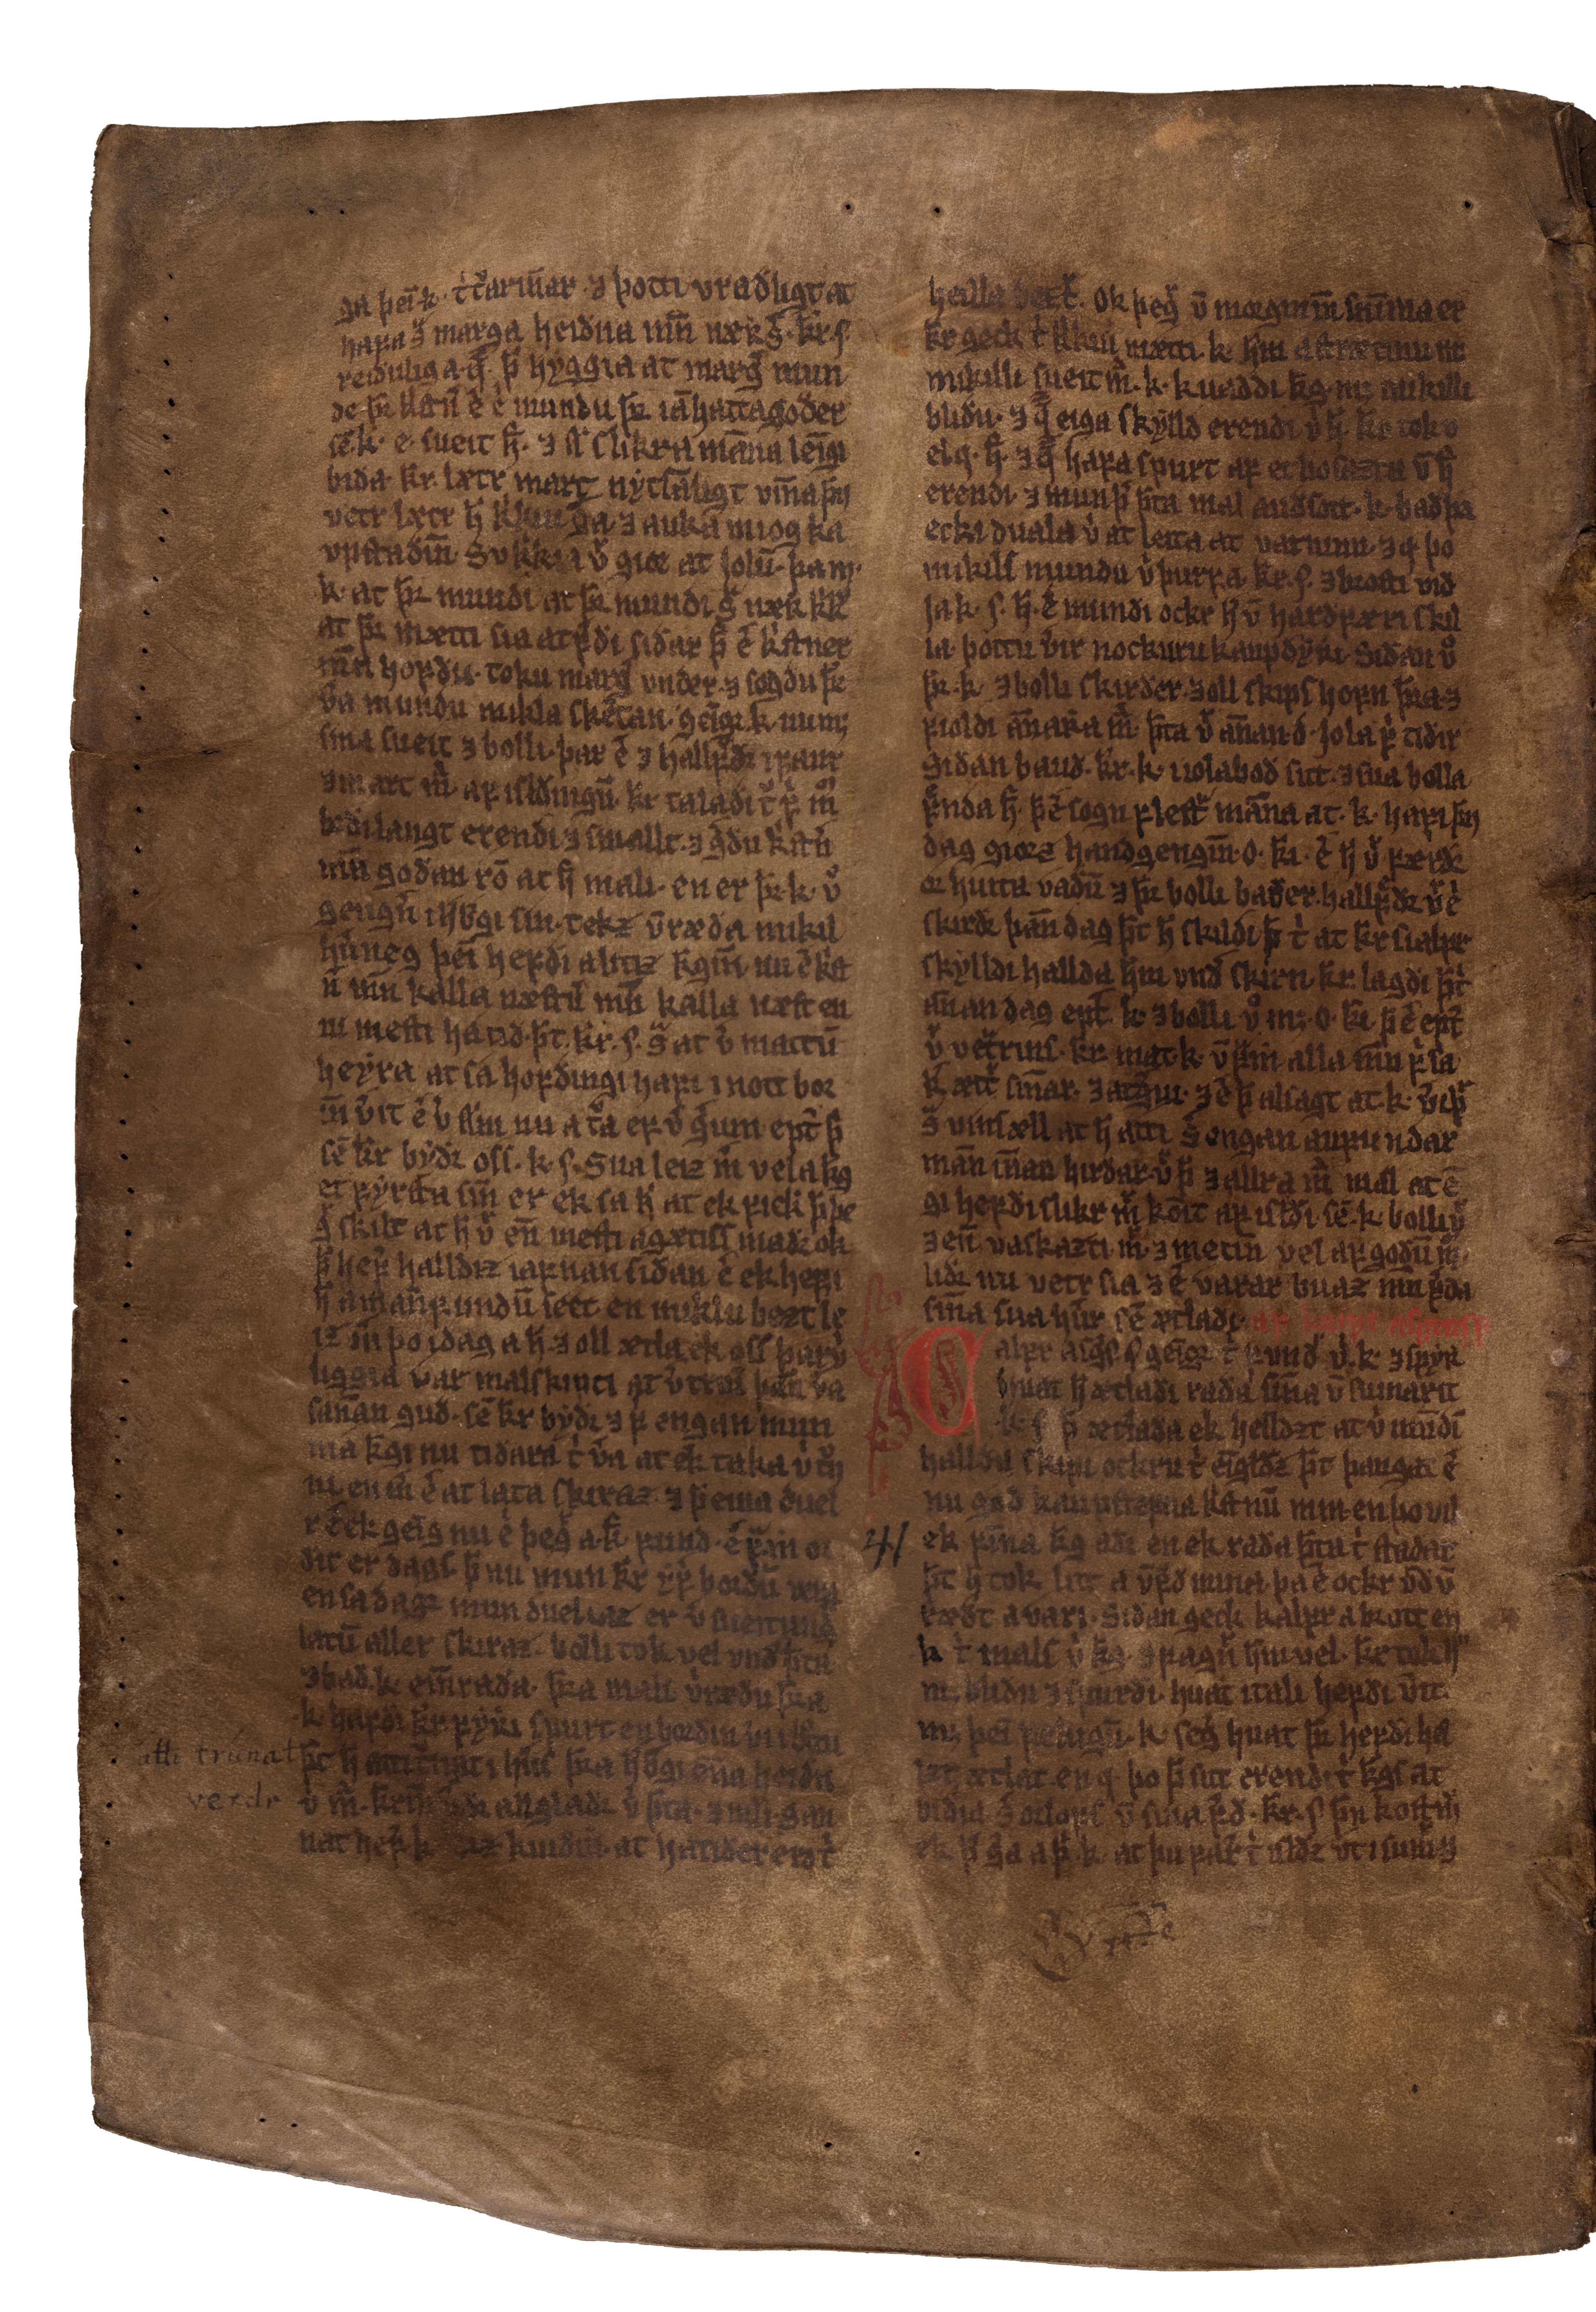 AM 132 fol - 176v